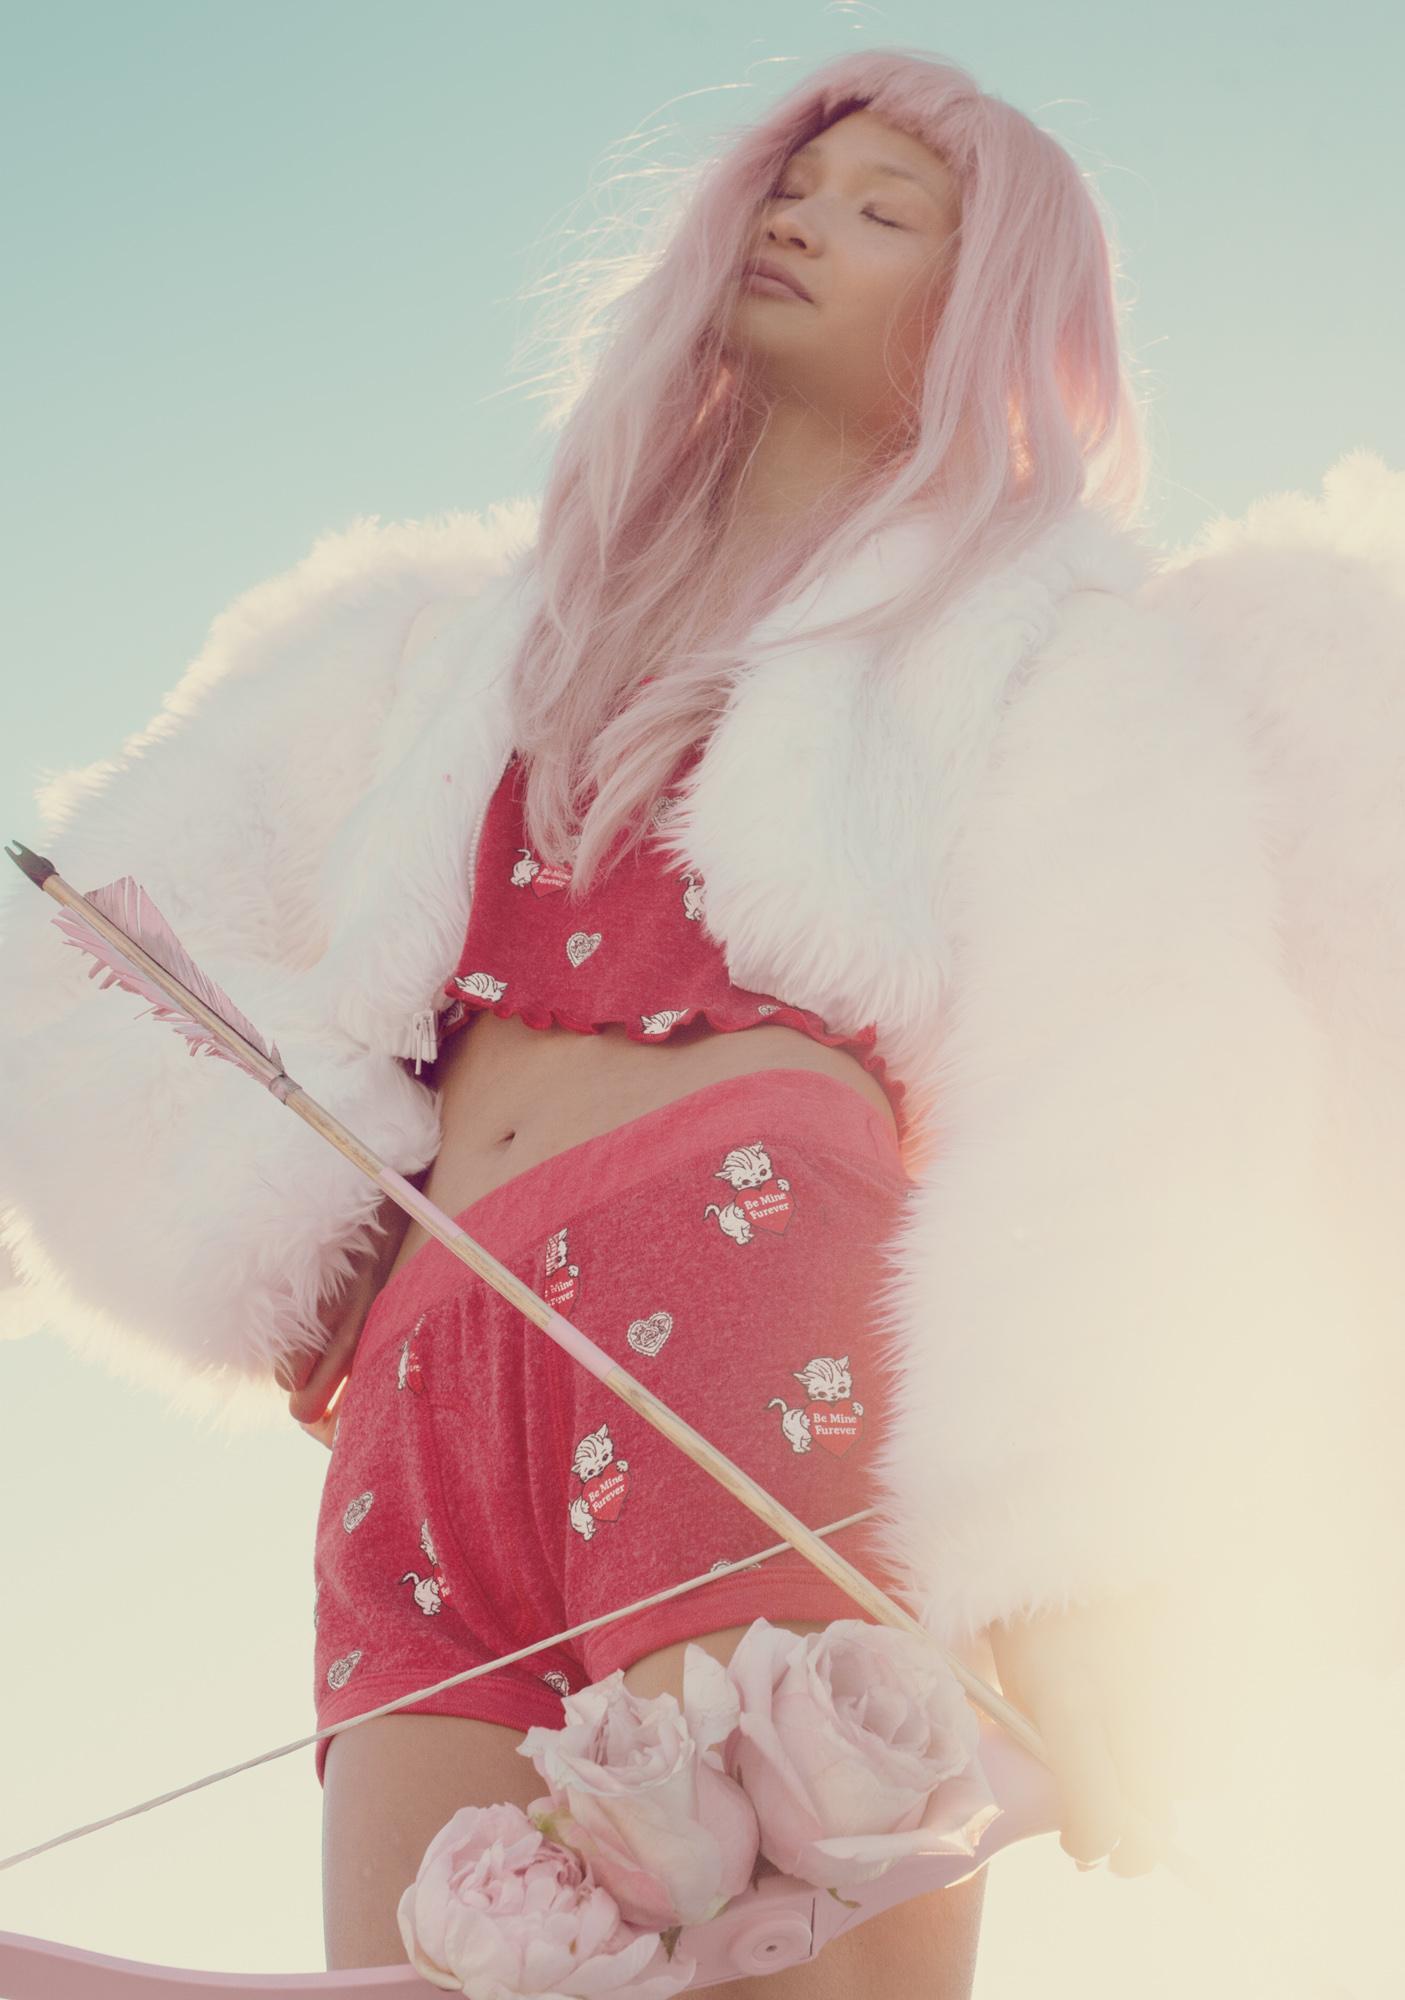 Wildfox Couture Furever Print High Waist Boy Shorts